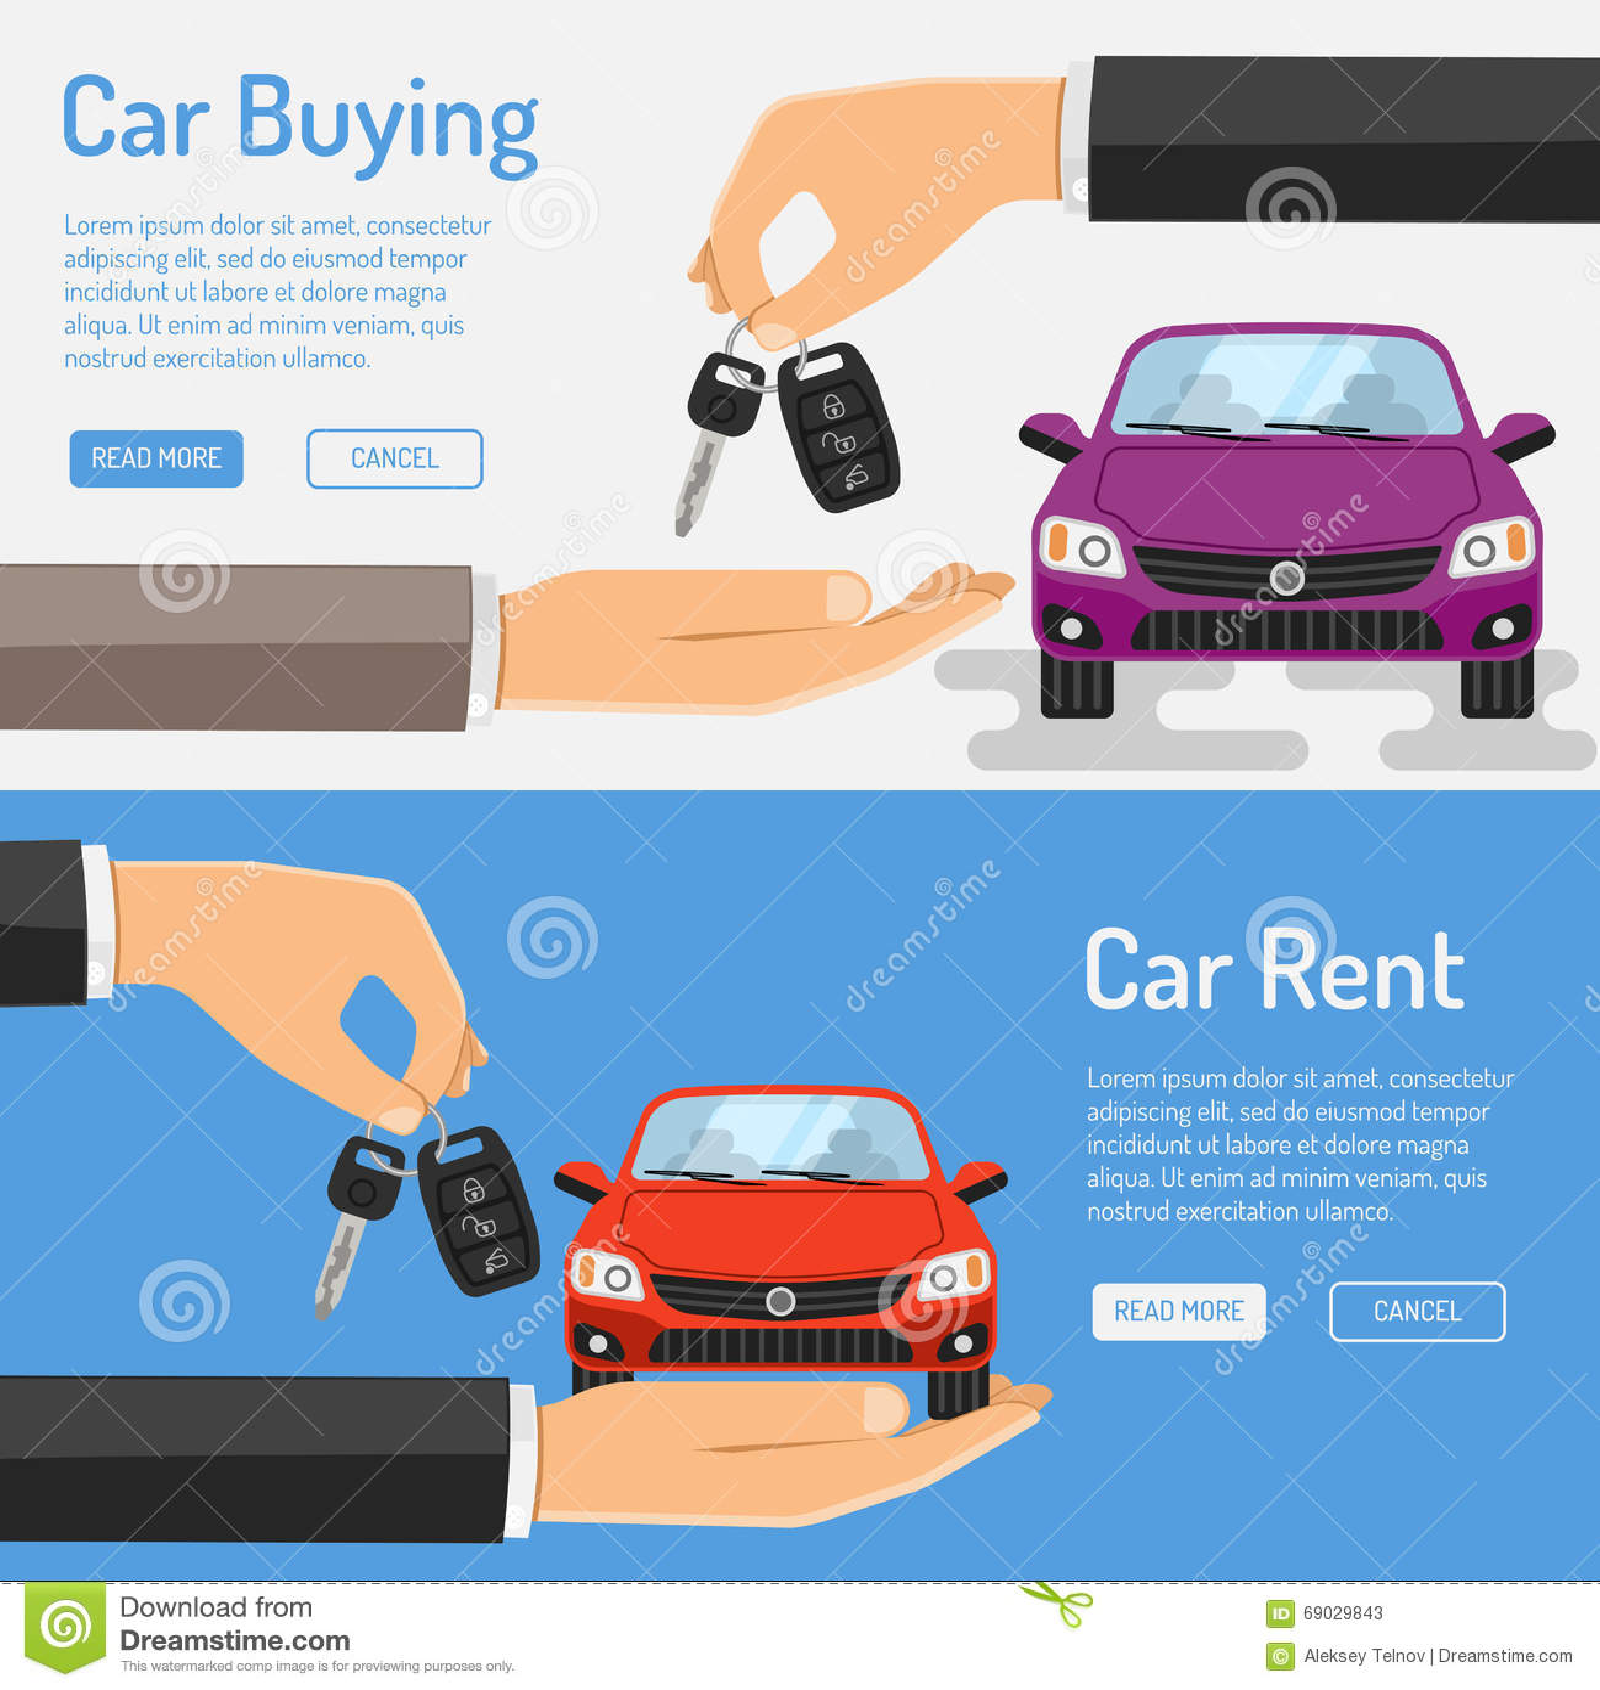 Rent Amd Buying Car Banner Stock Vector Illustration Of Banner 69029843